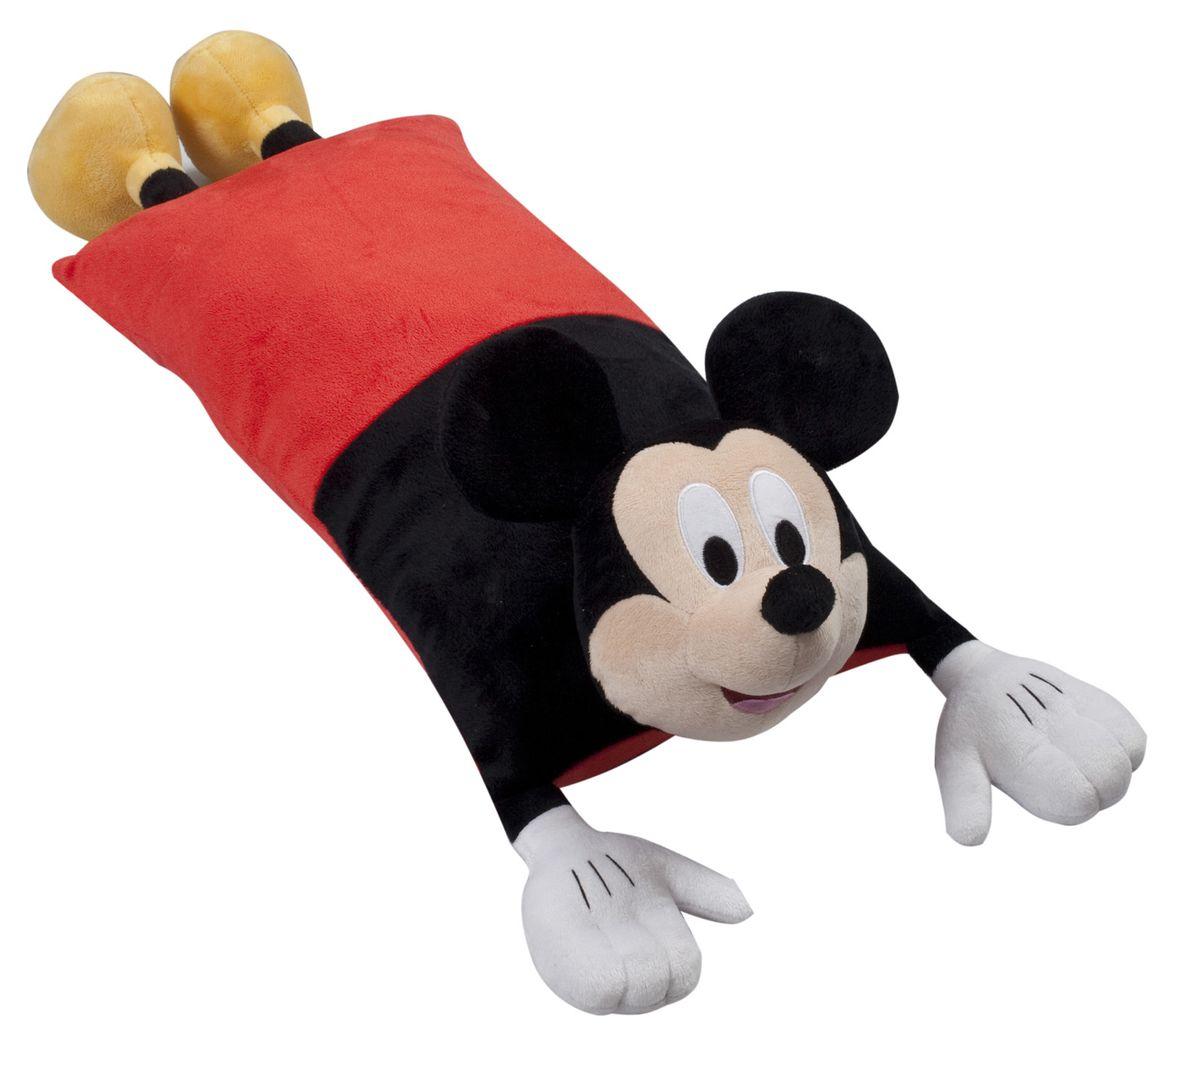 15545 Подушка Mickey Mouse (Микки Маус), размер 50х25 см